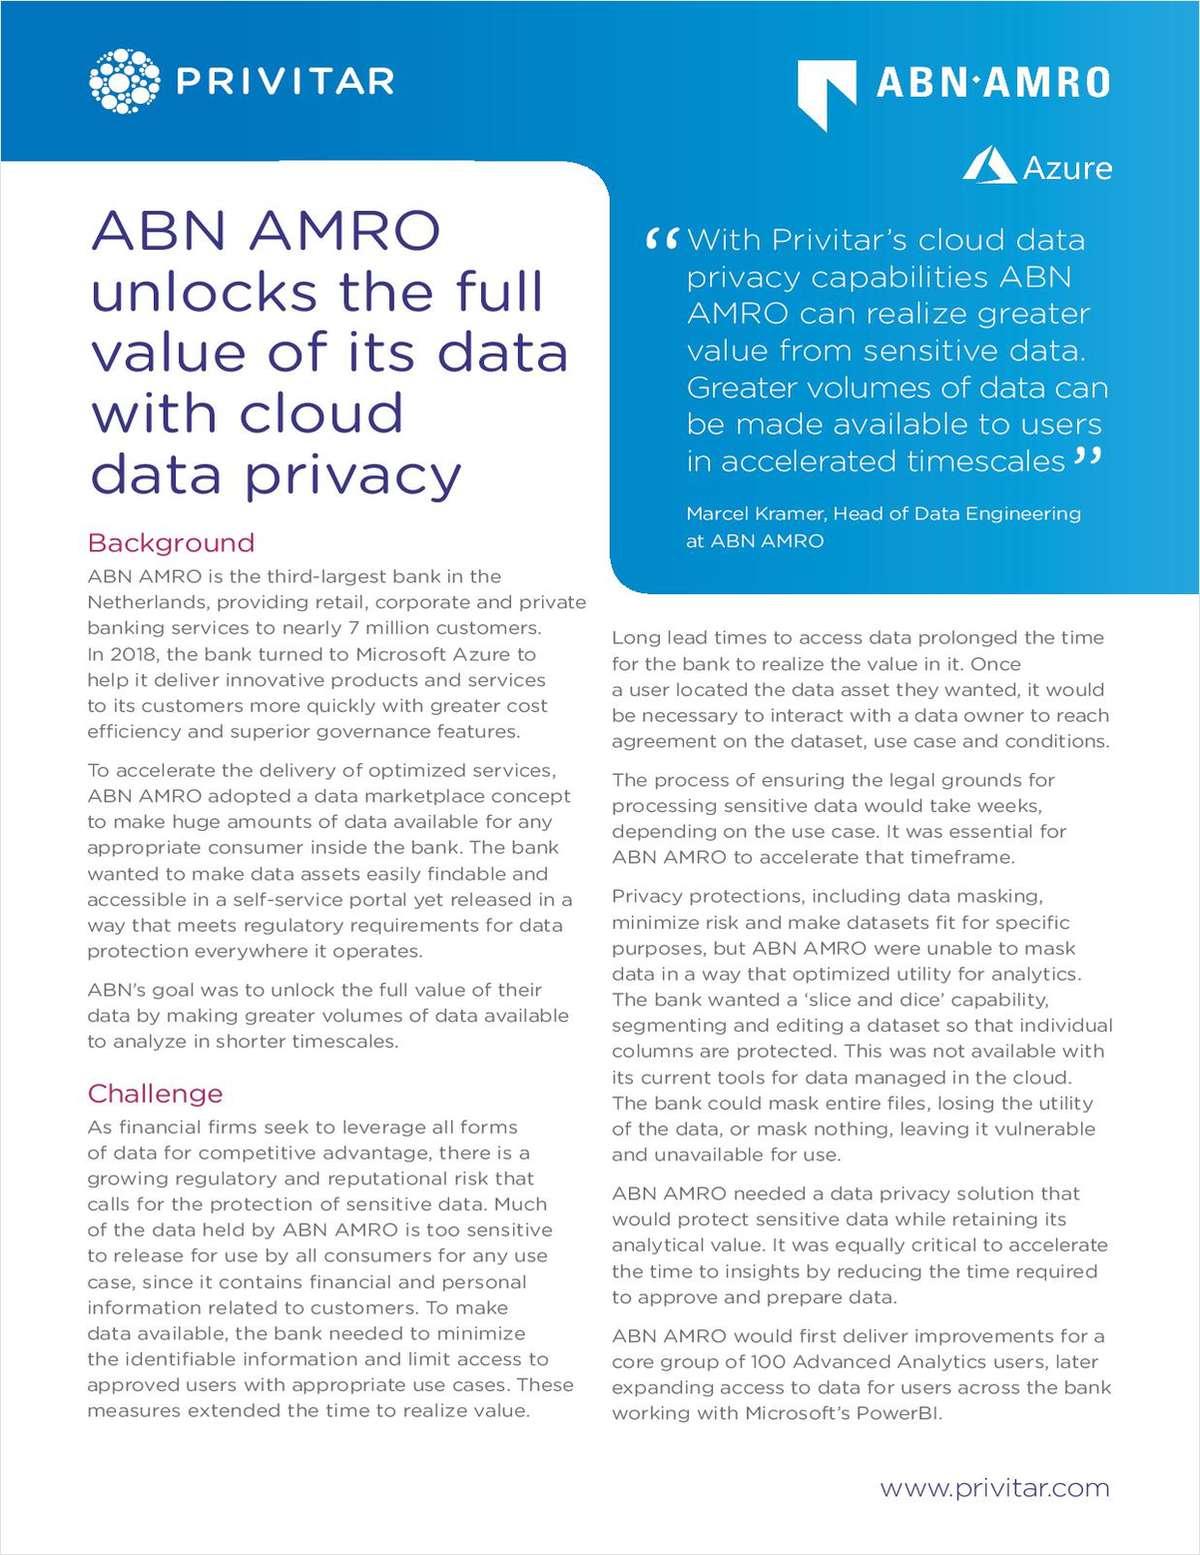 Case Study: ABN AMRO